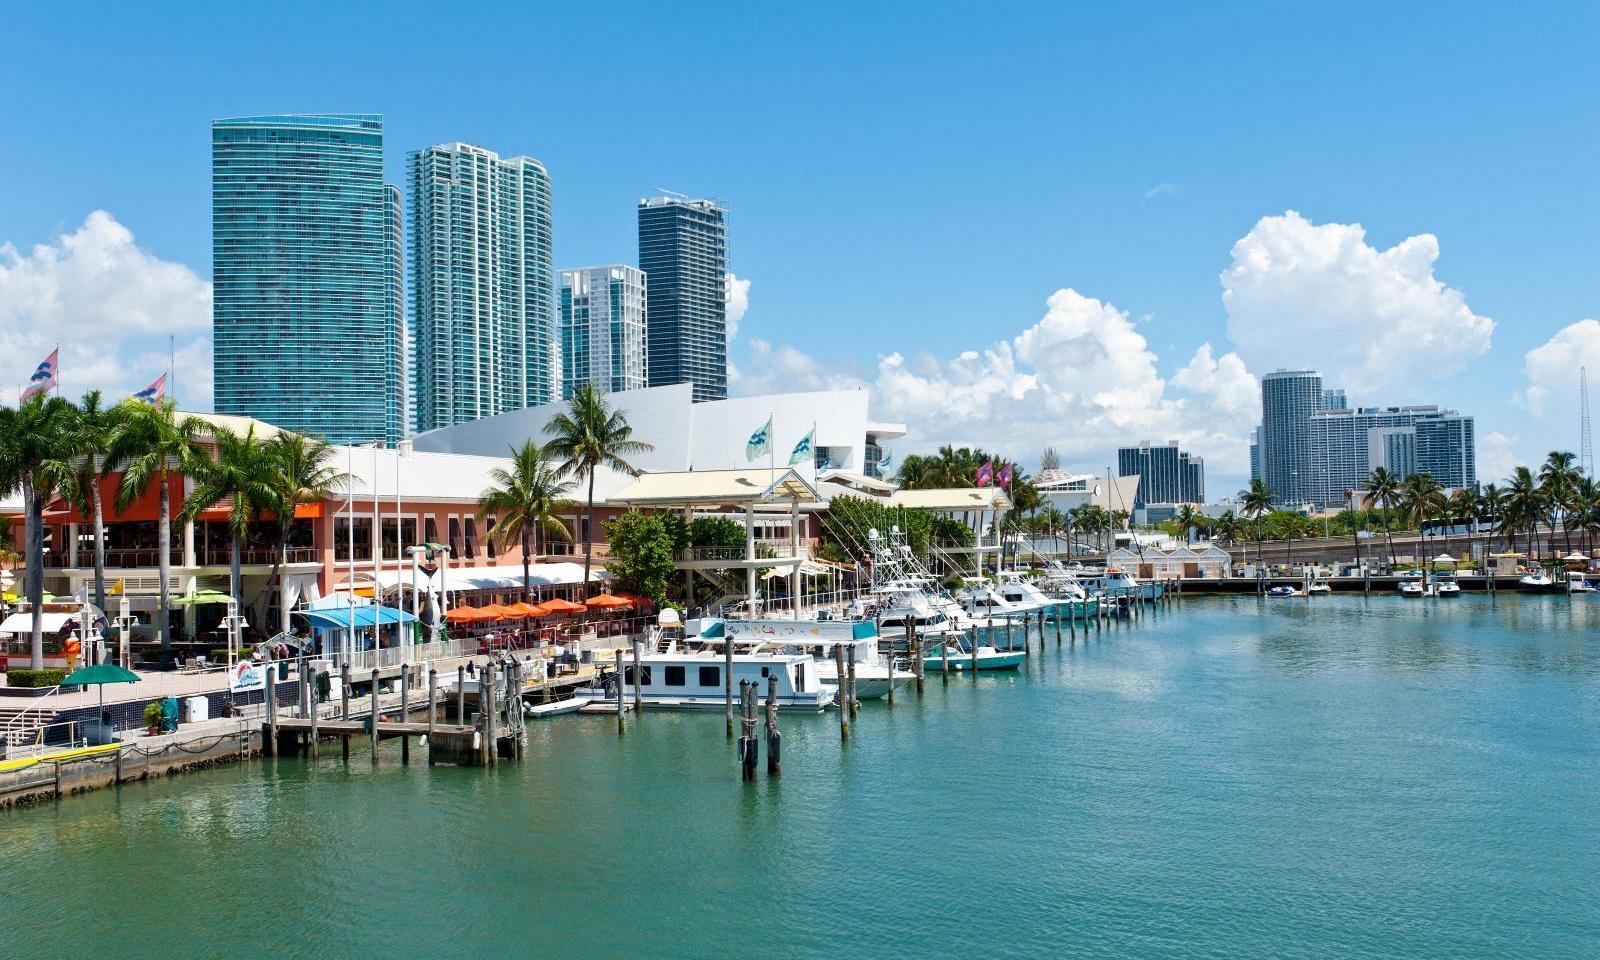 Miami Bayside Marketplace